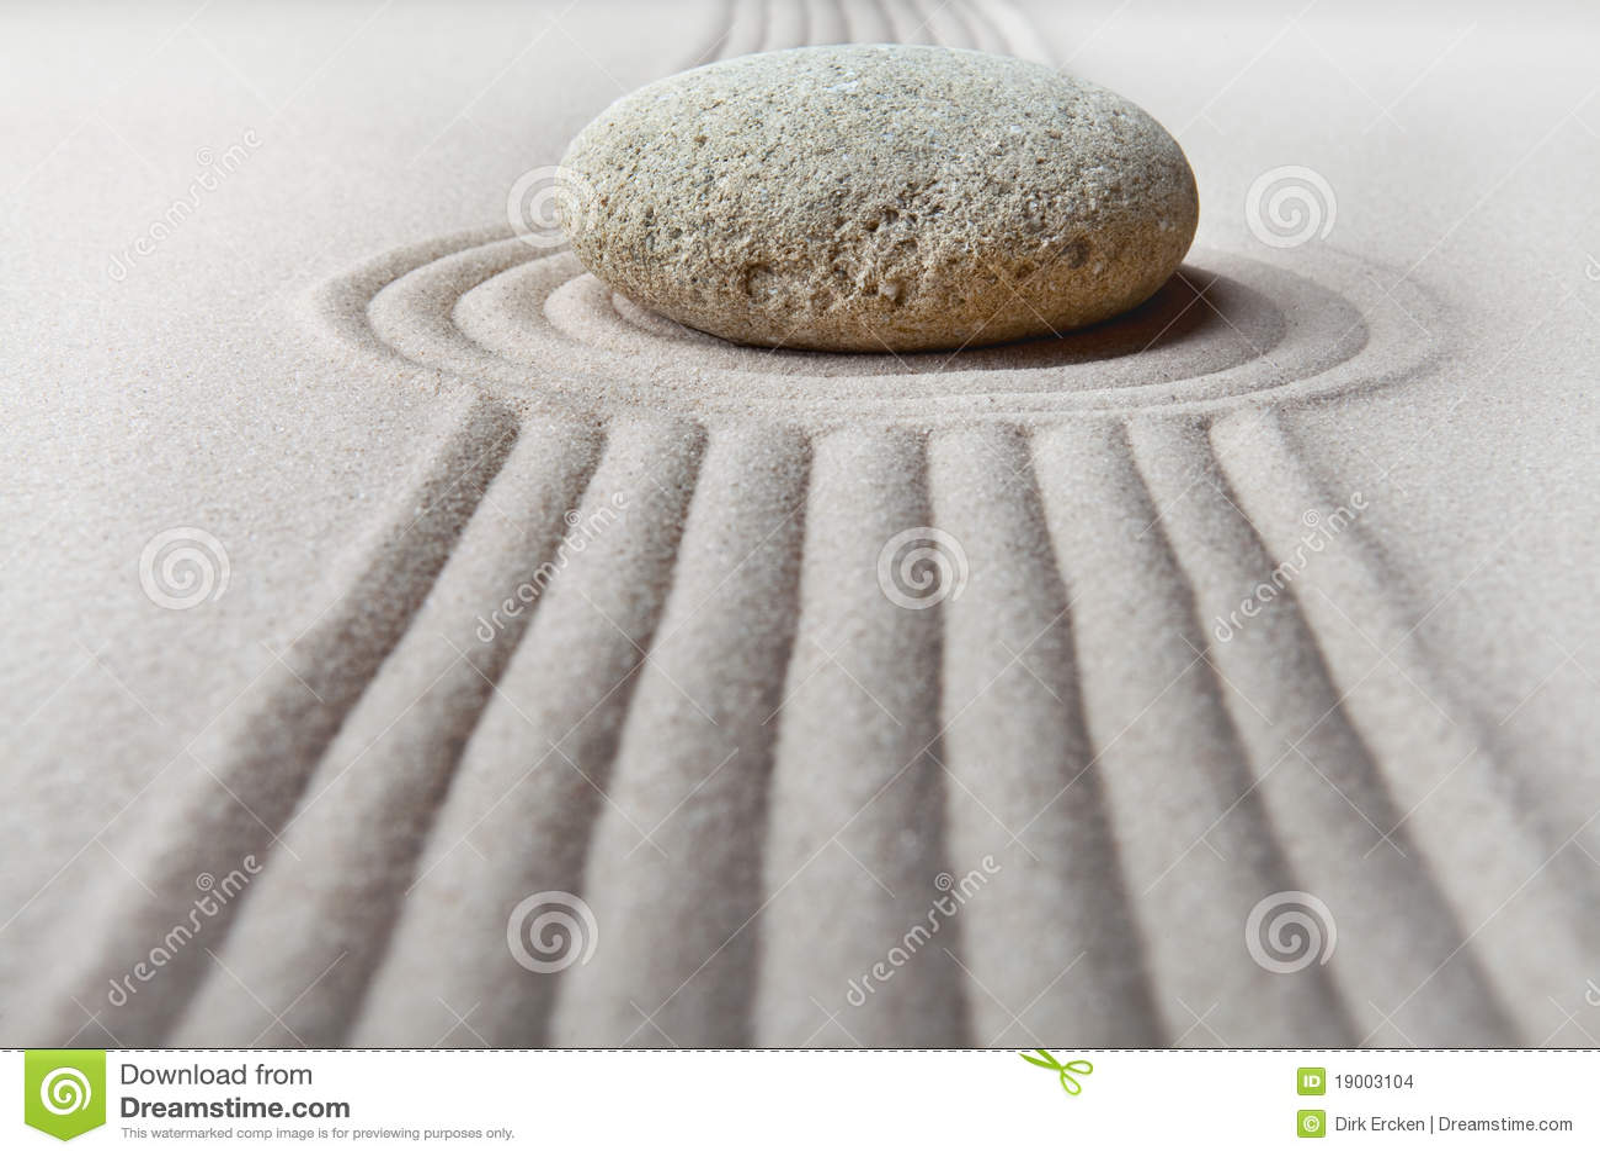 Zen Garden Raked Sand And Stone Pattern Stock Images